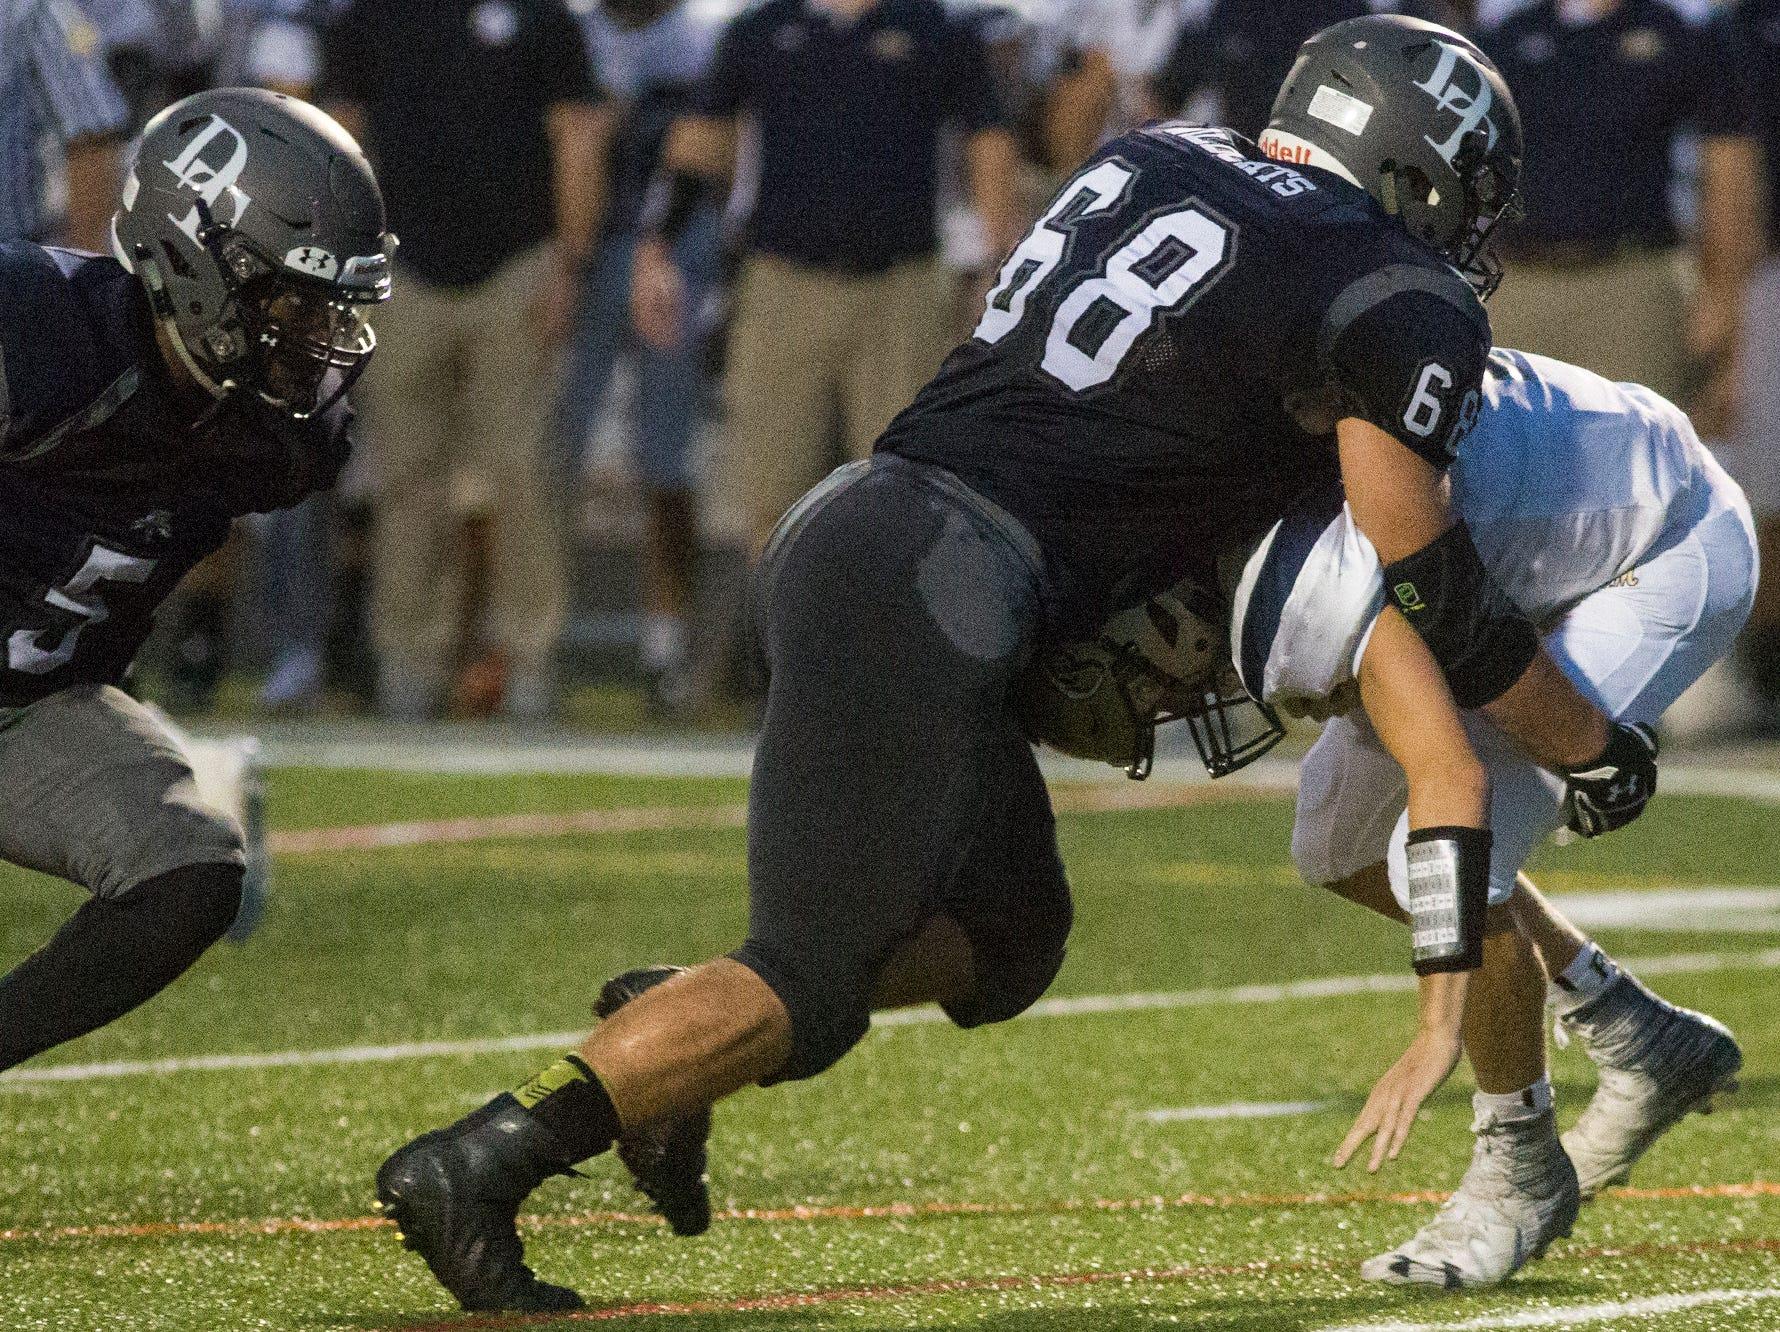 Dallastown's Noah Strine sacks Penn Manor quarterback Aaron Gale. Dallastown defeats Penn Manor 42-7 in football at Dallastown Area High School in Dallastown, Friday, September 7, 2018.